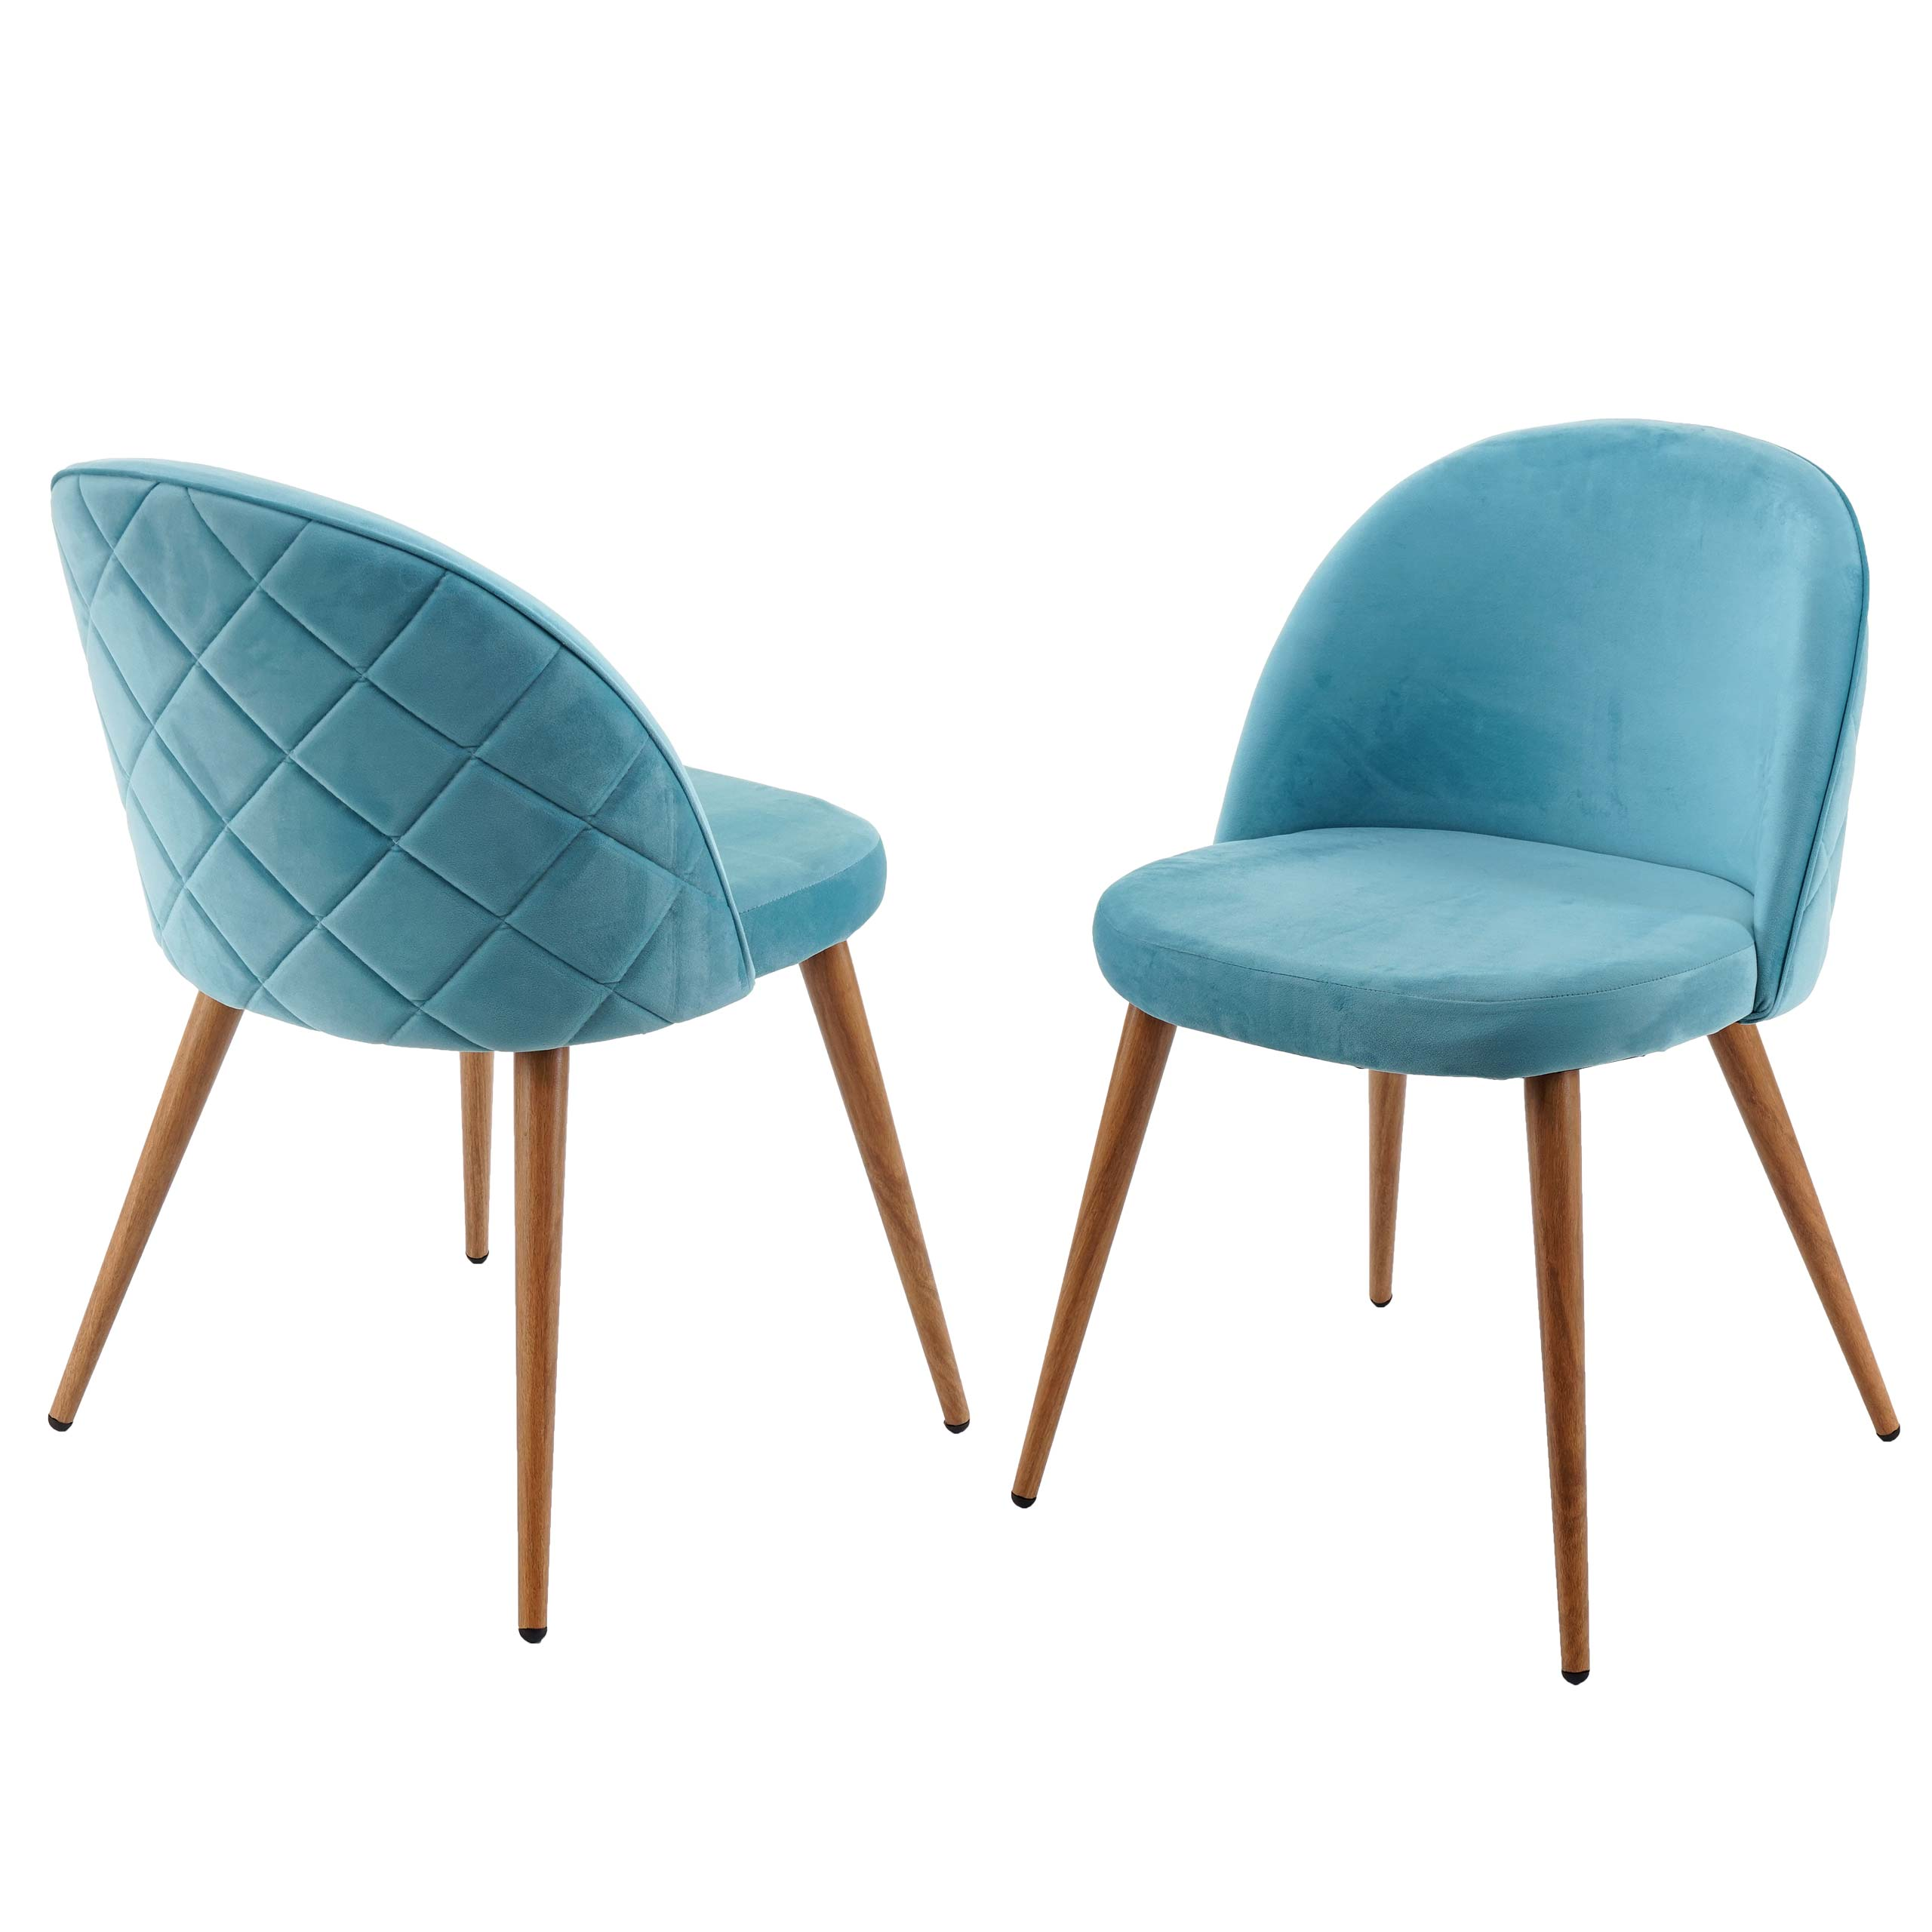 Mendler 2X Esszimmerstuhl HWC-D53, Stuhl Küchenstuhl Retro 50er Jahre Design, Samt ' türkis